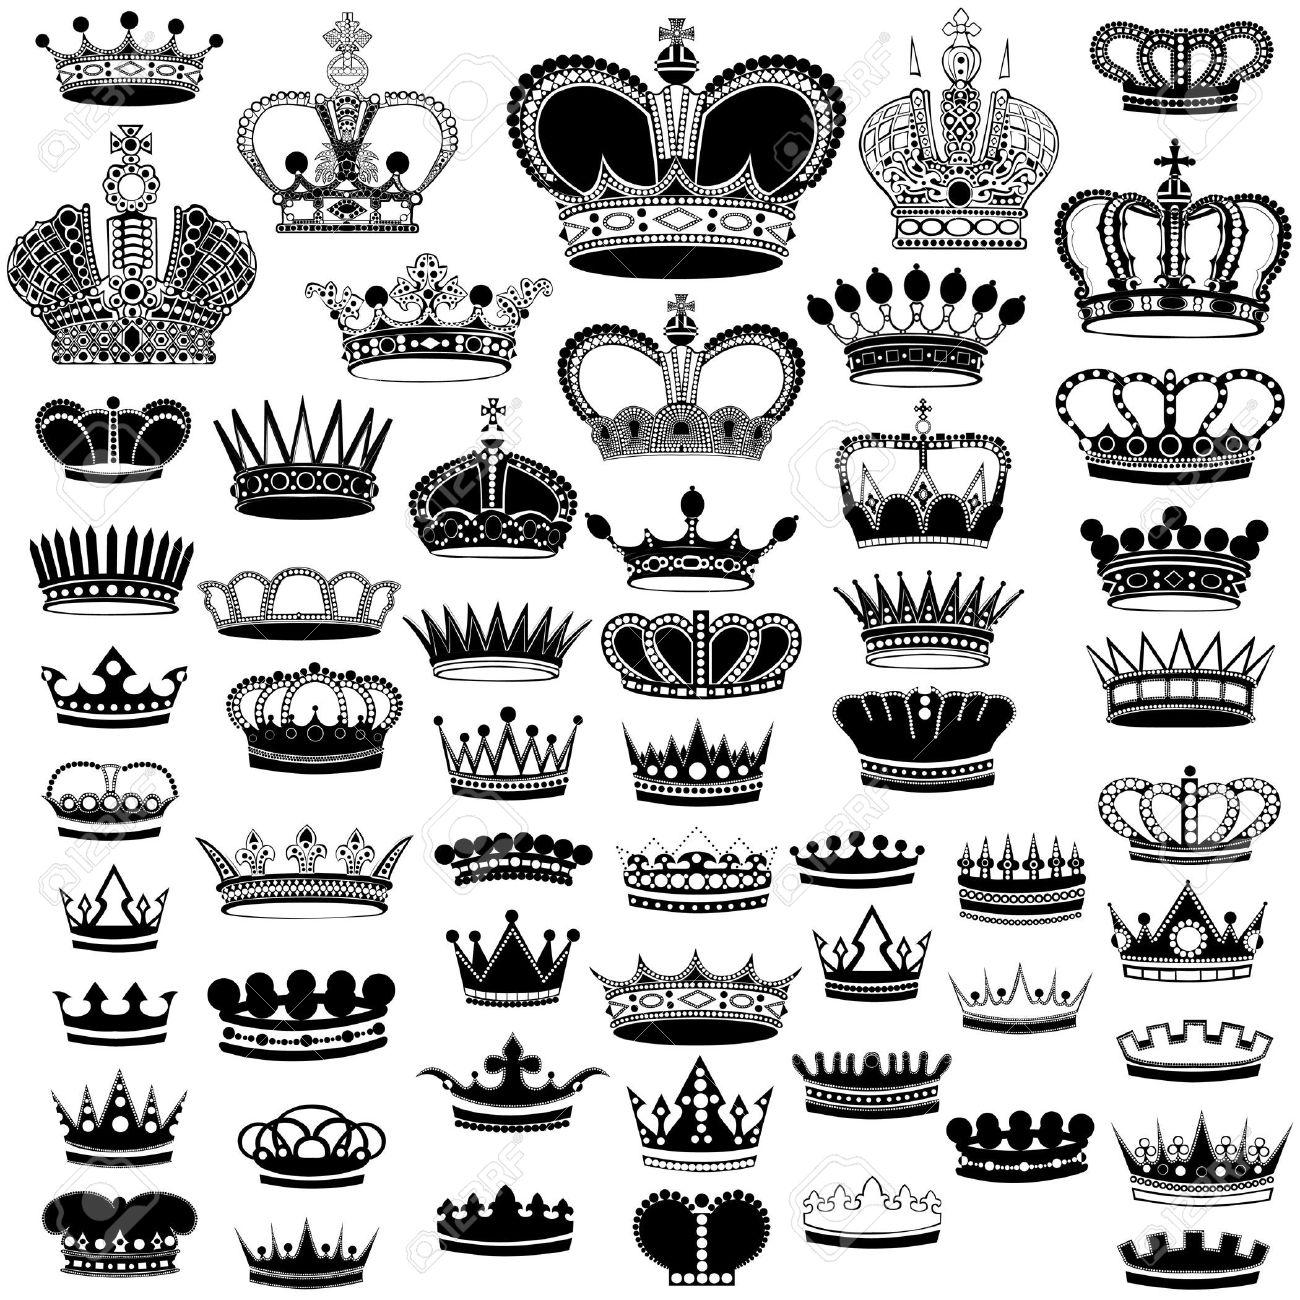 King Crown: Big Silhouette Crown Set